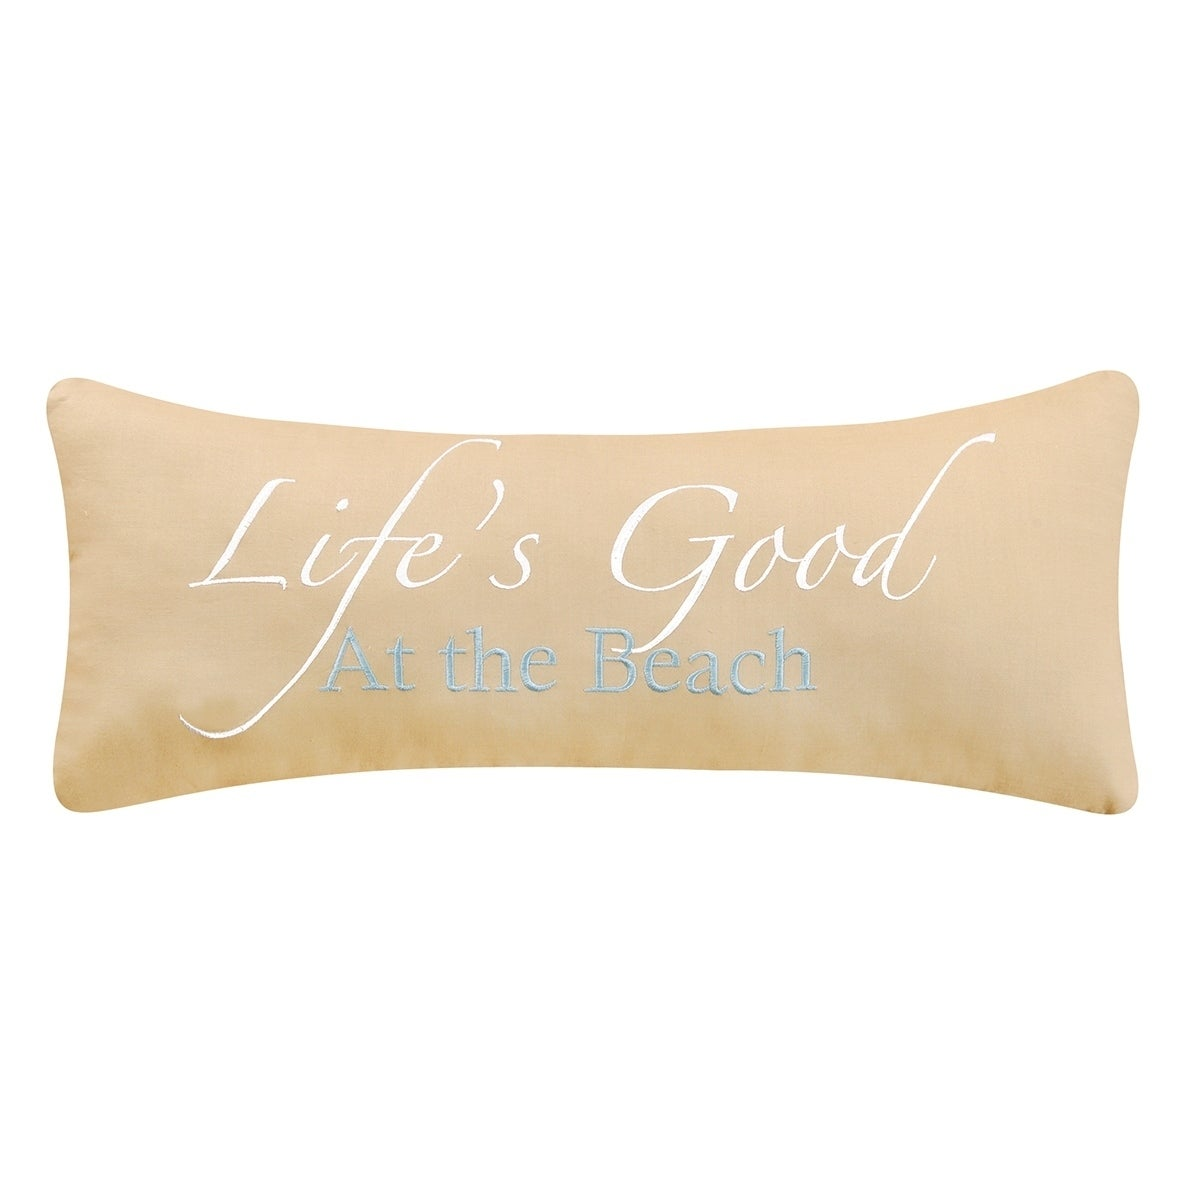 Lifes Good At The Beach 8 x 20 Pillow